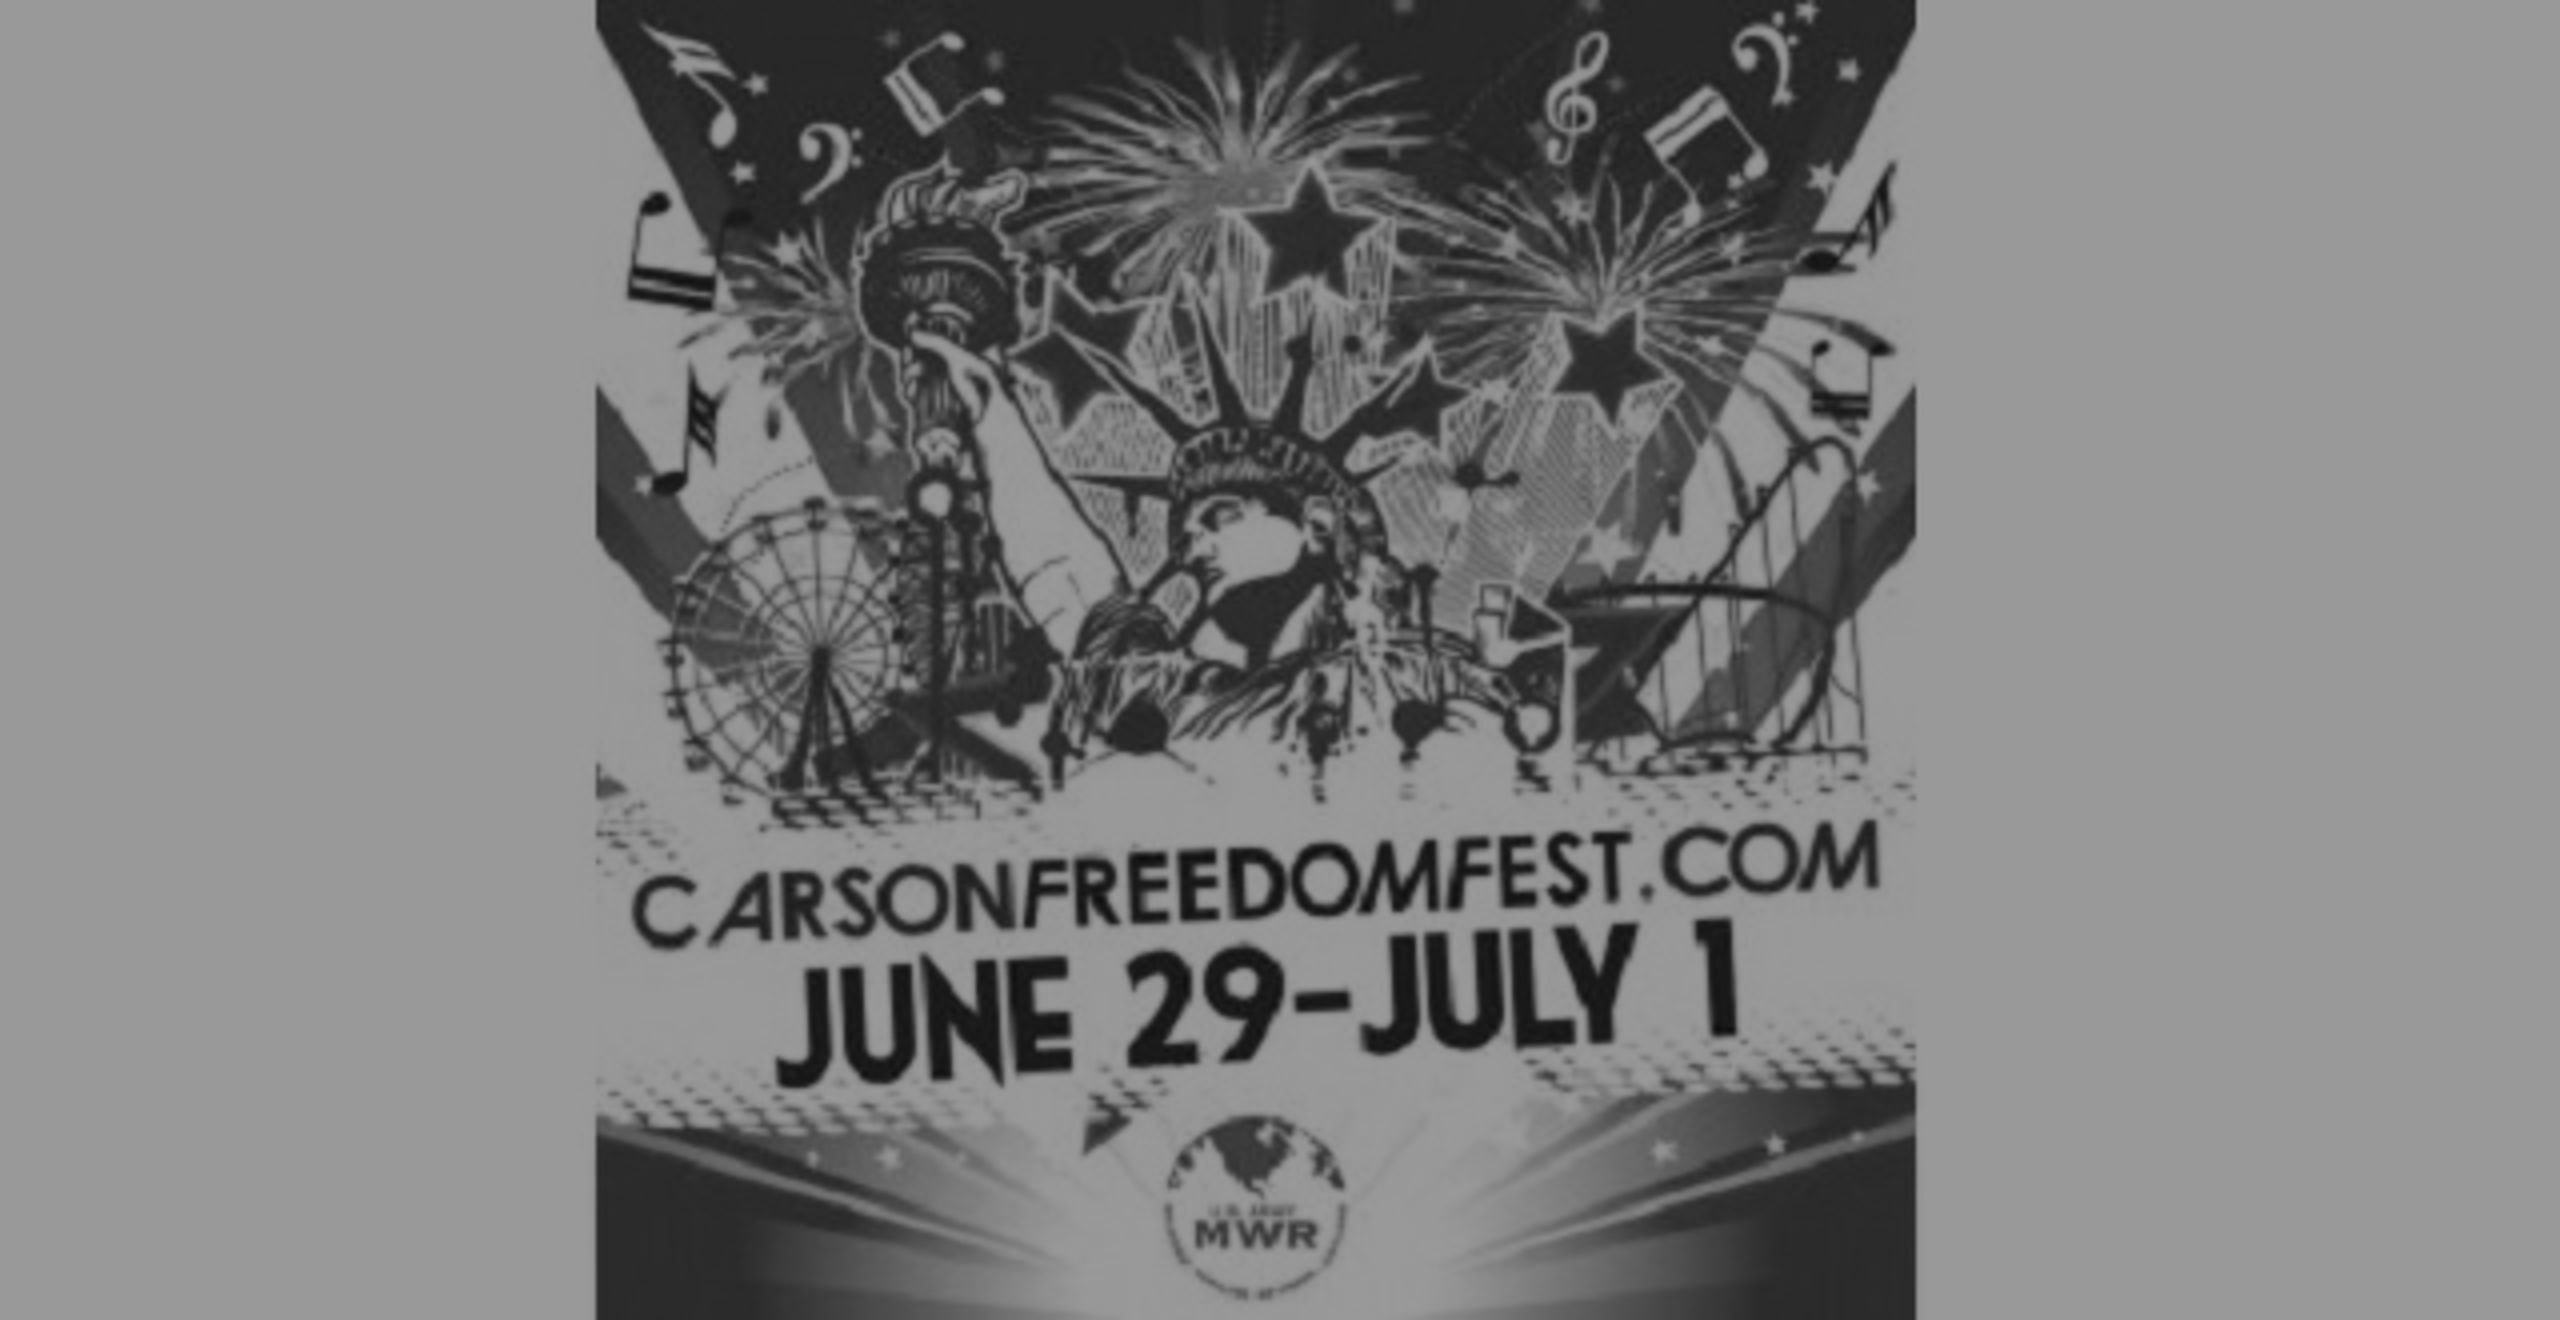 Fort Carson Freedom Fest 2018